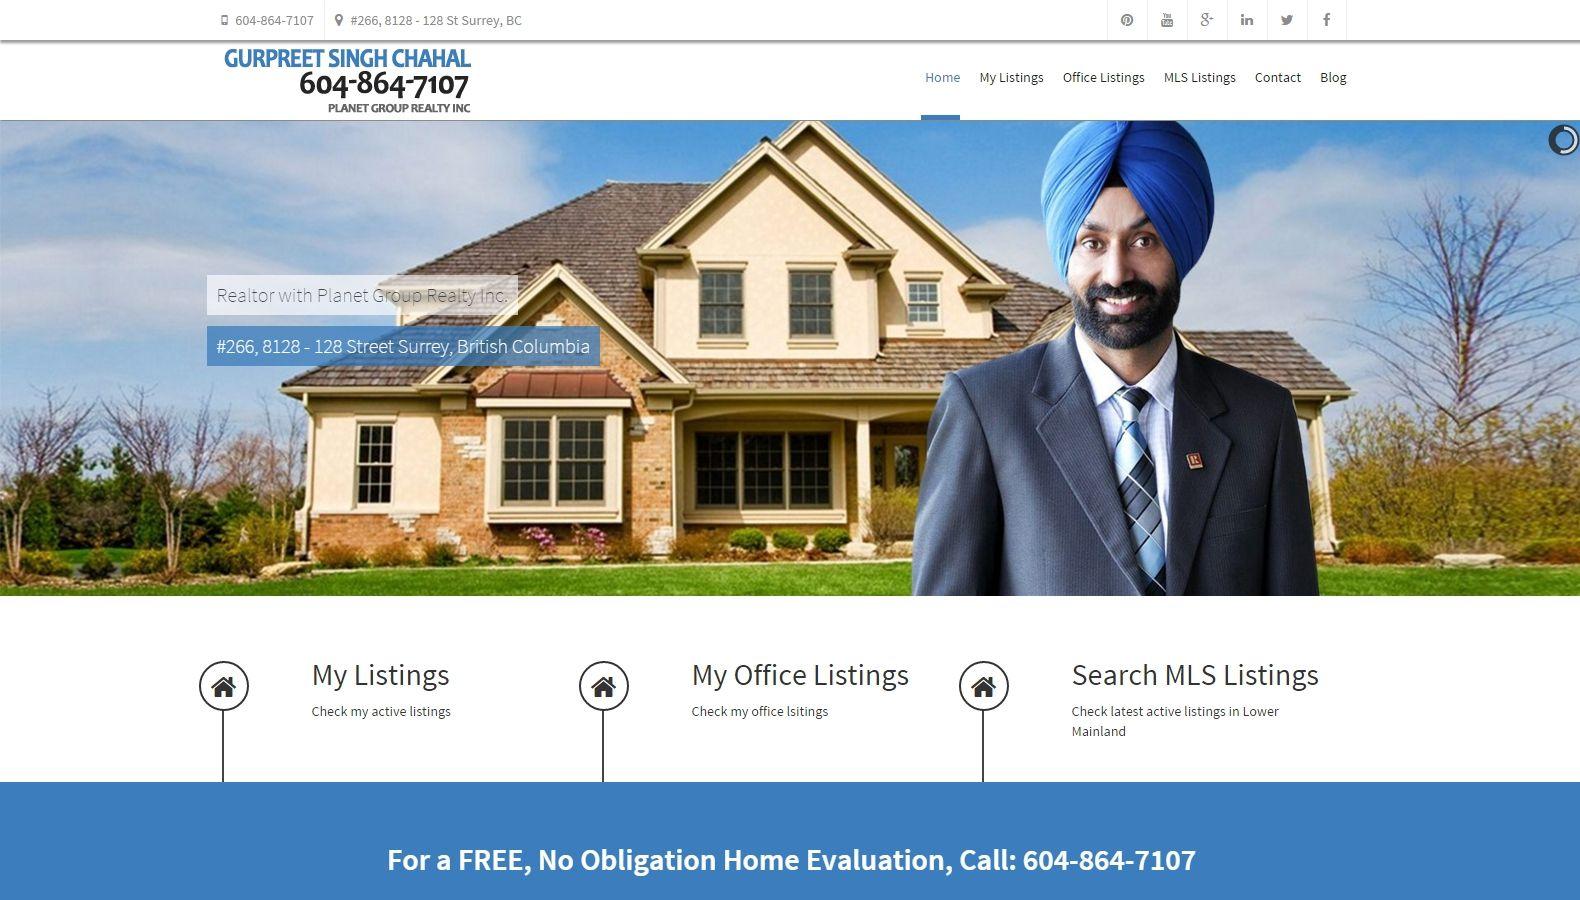 Realtor Gurpreet Singh Chahal – Website Designing By SEOTeam.ca